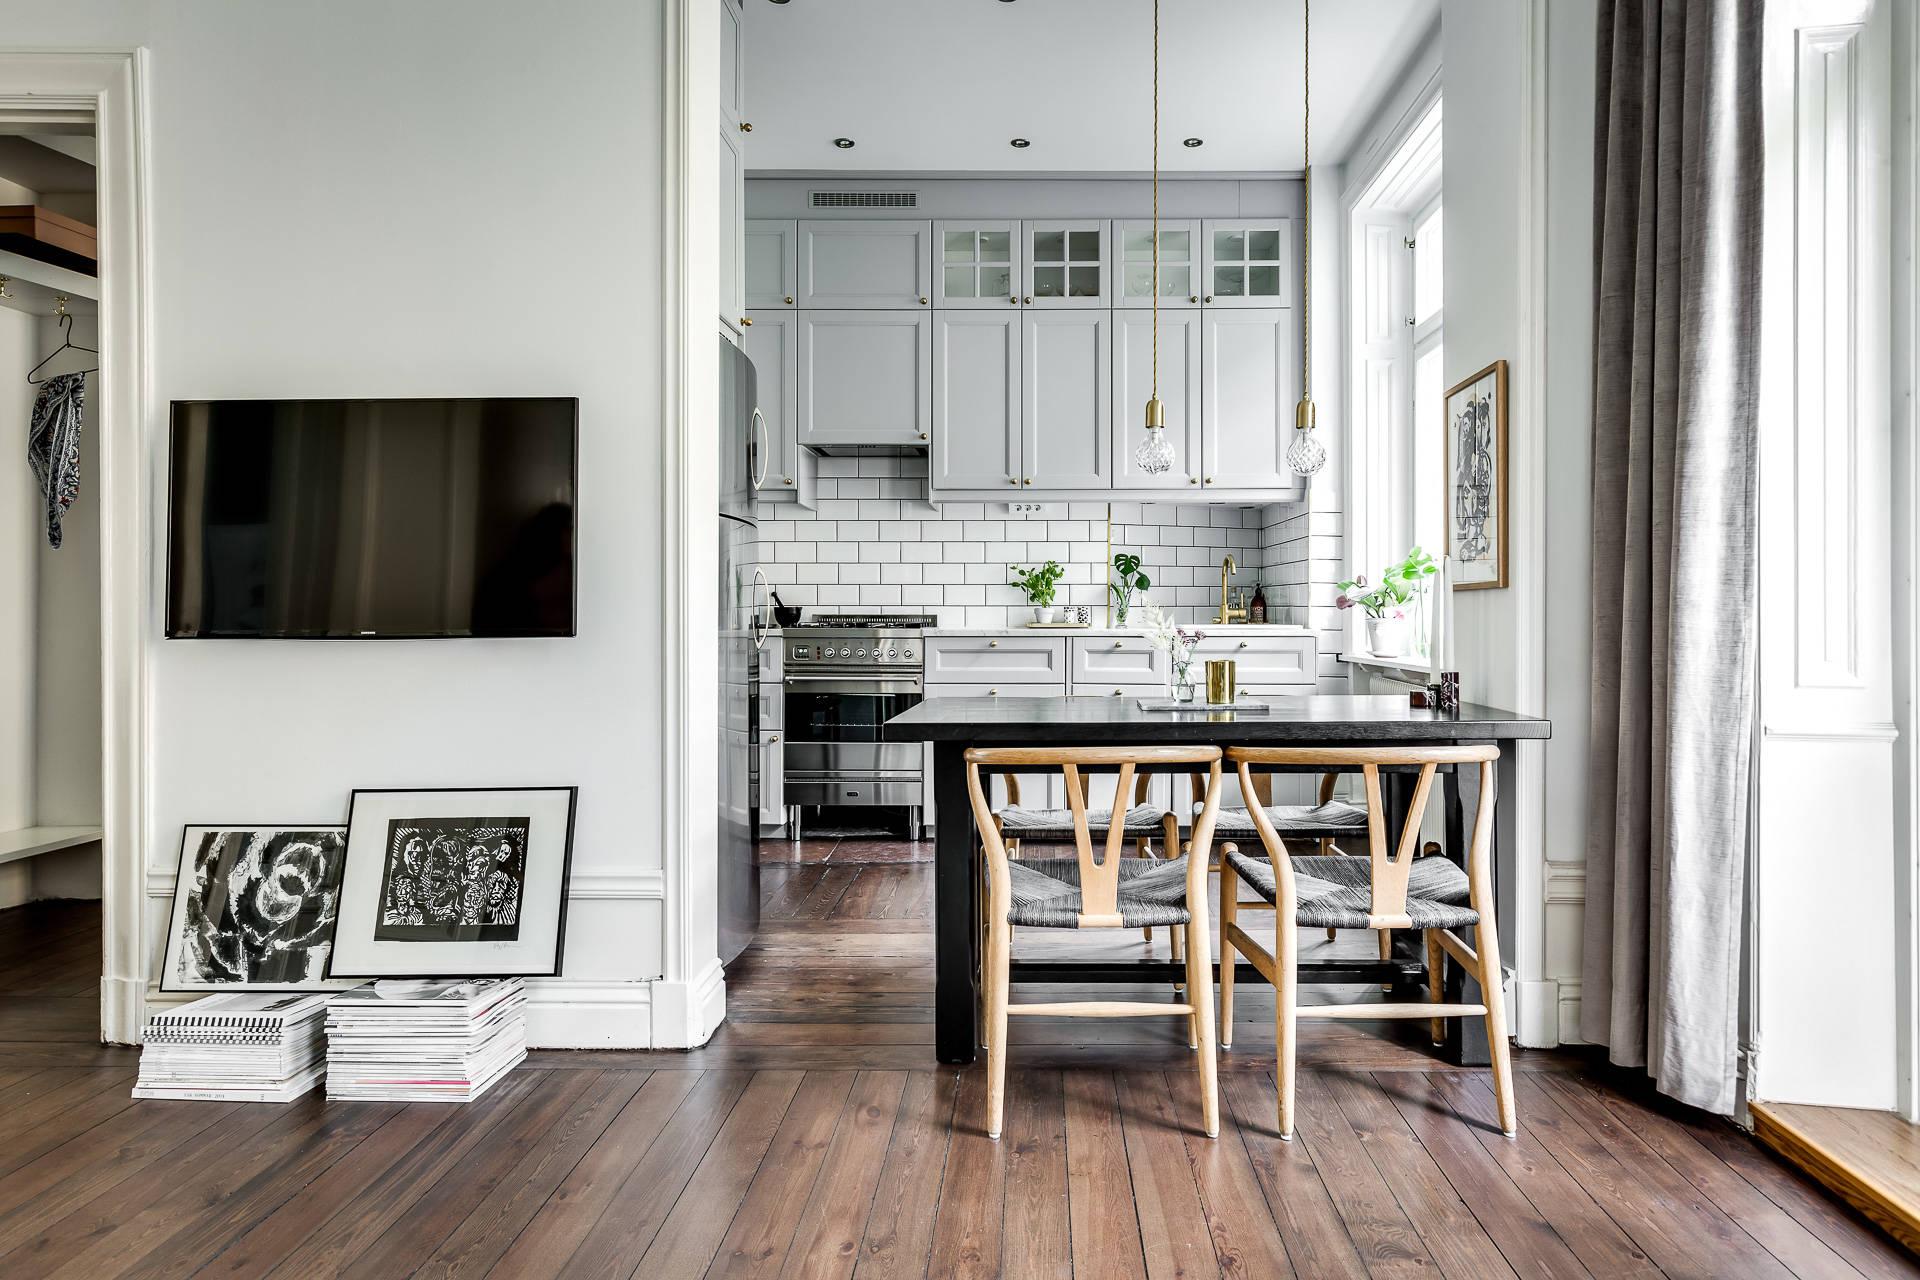 cocinas escandinavas – Interiores Chic | Blog de decoración nórdica